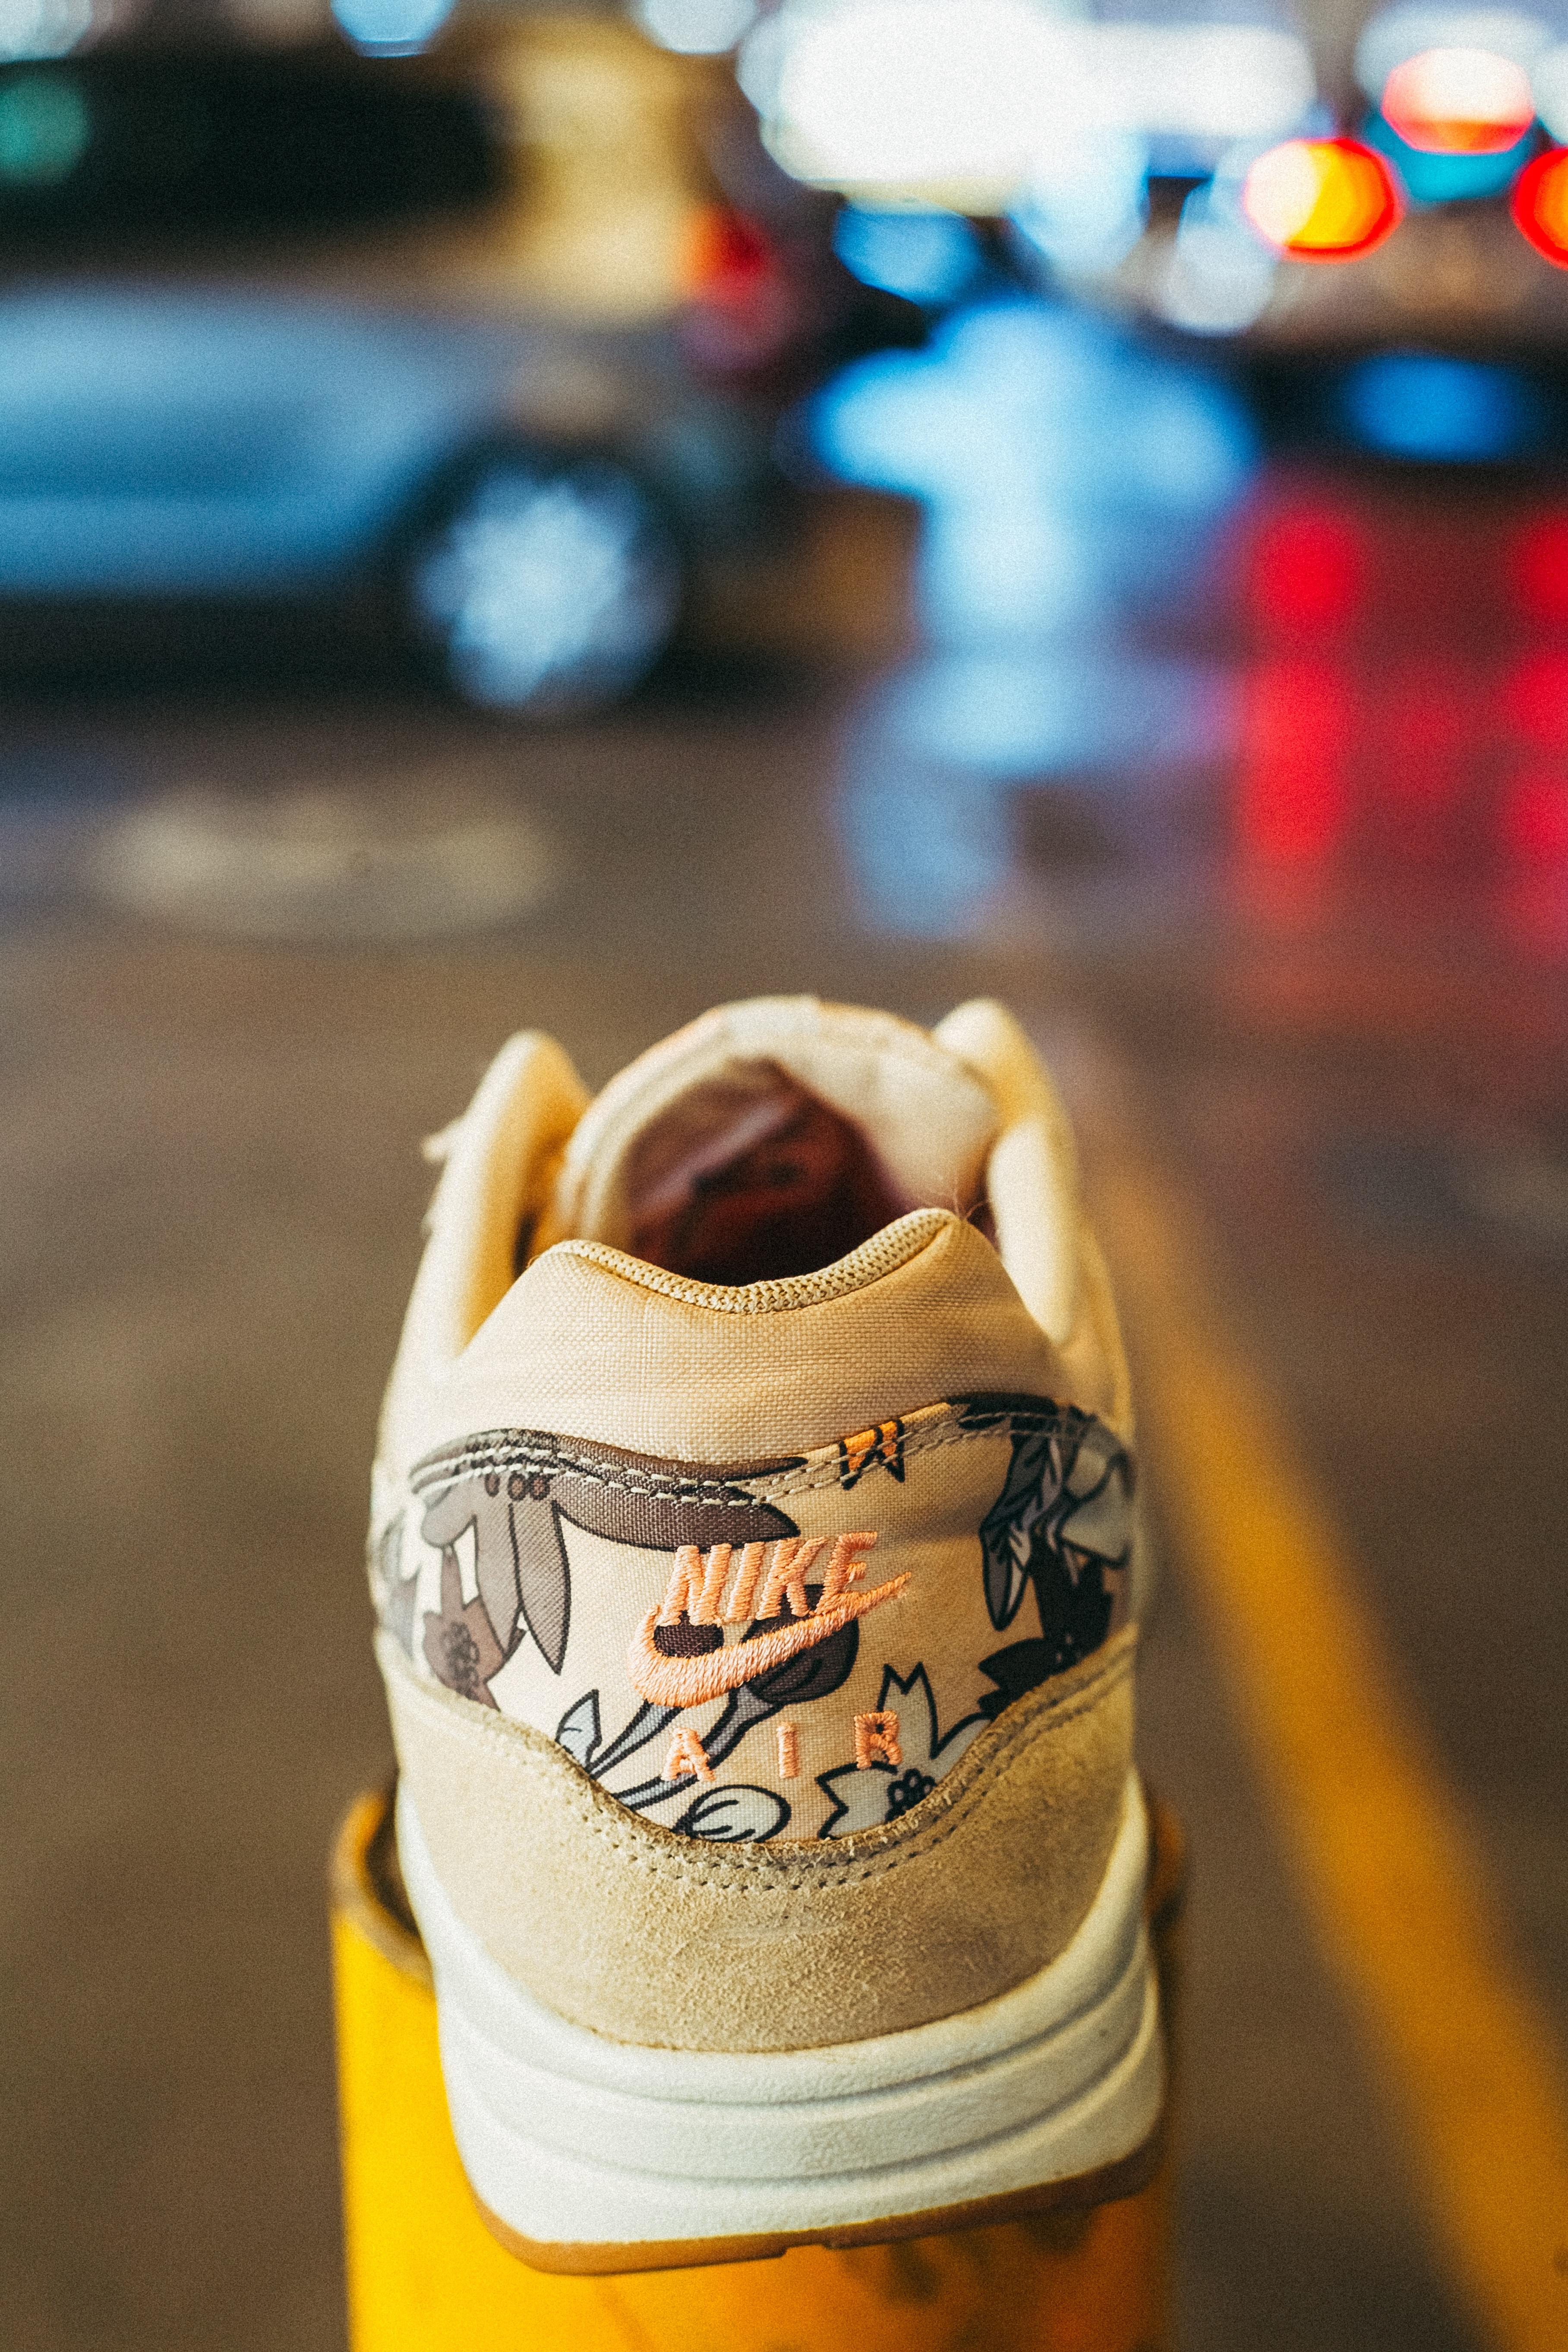 beige Nike Air Force 1 low shoe